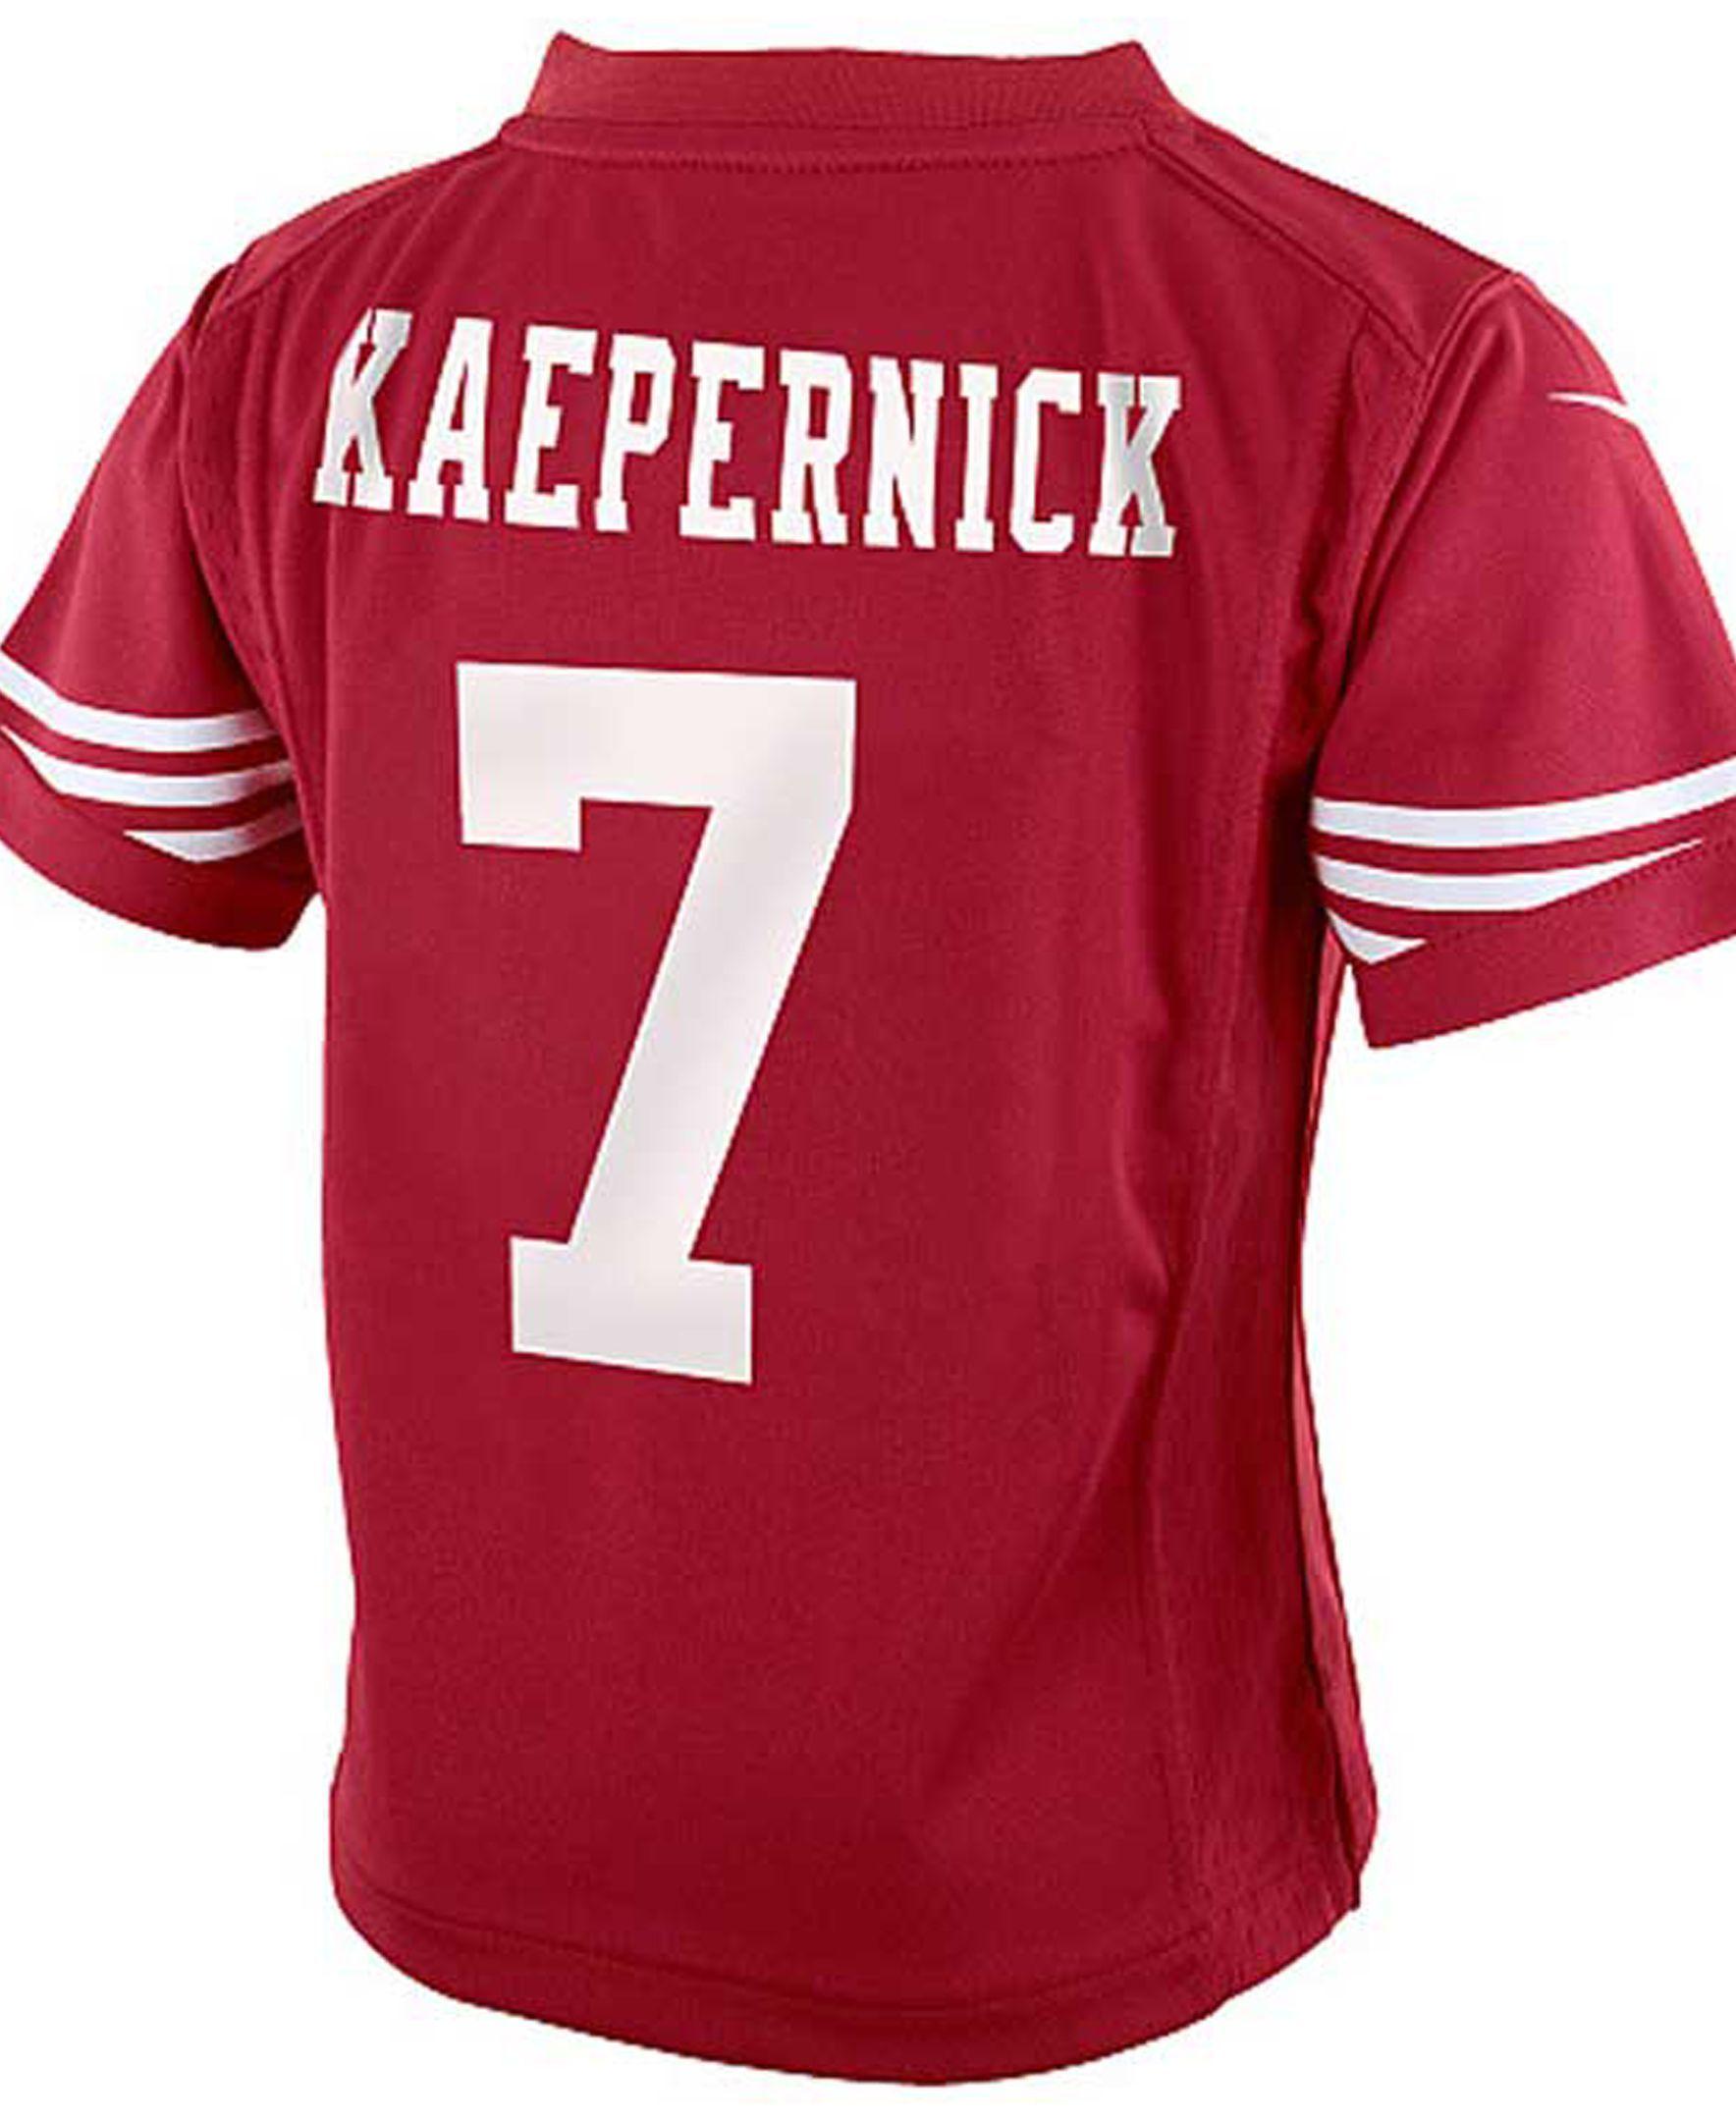 0073625c Nike Kids' Colin Kaepernick San Francisco 49ers Jersey | Products ...